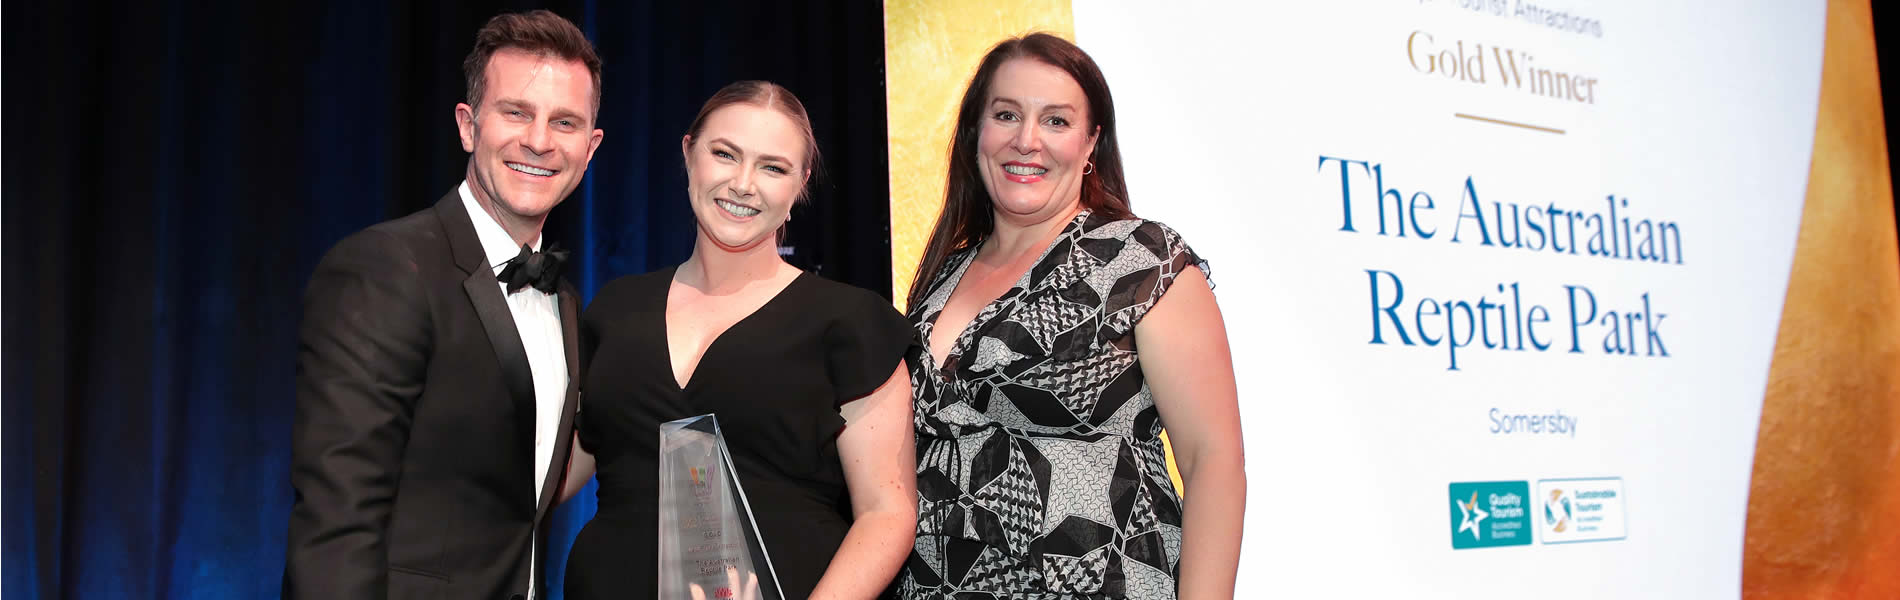 Awards of the Australian Reptile Park